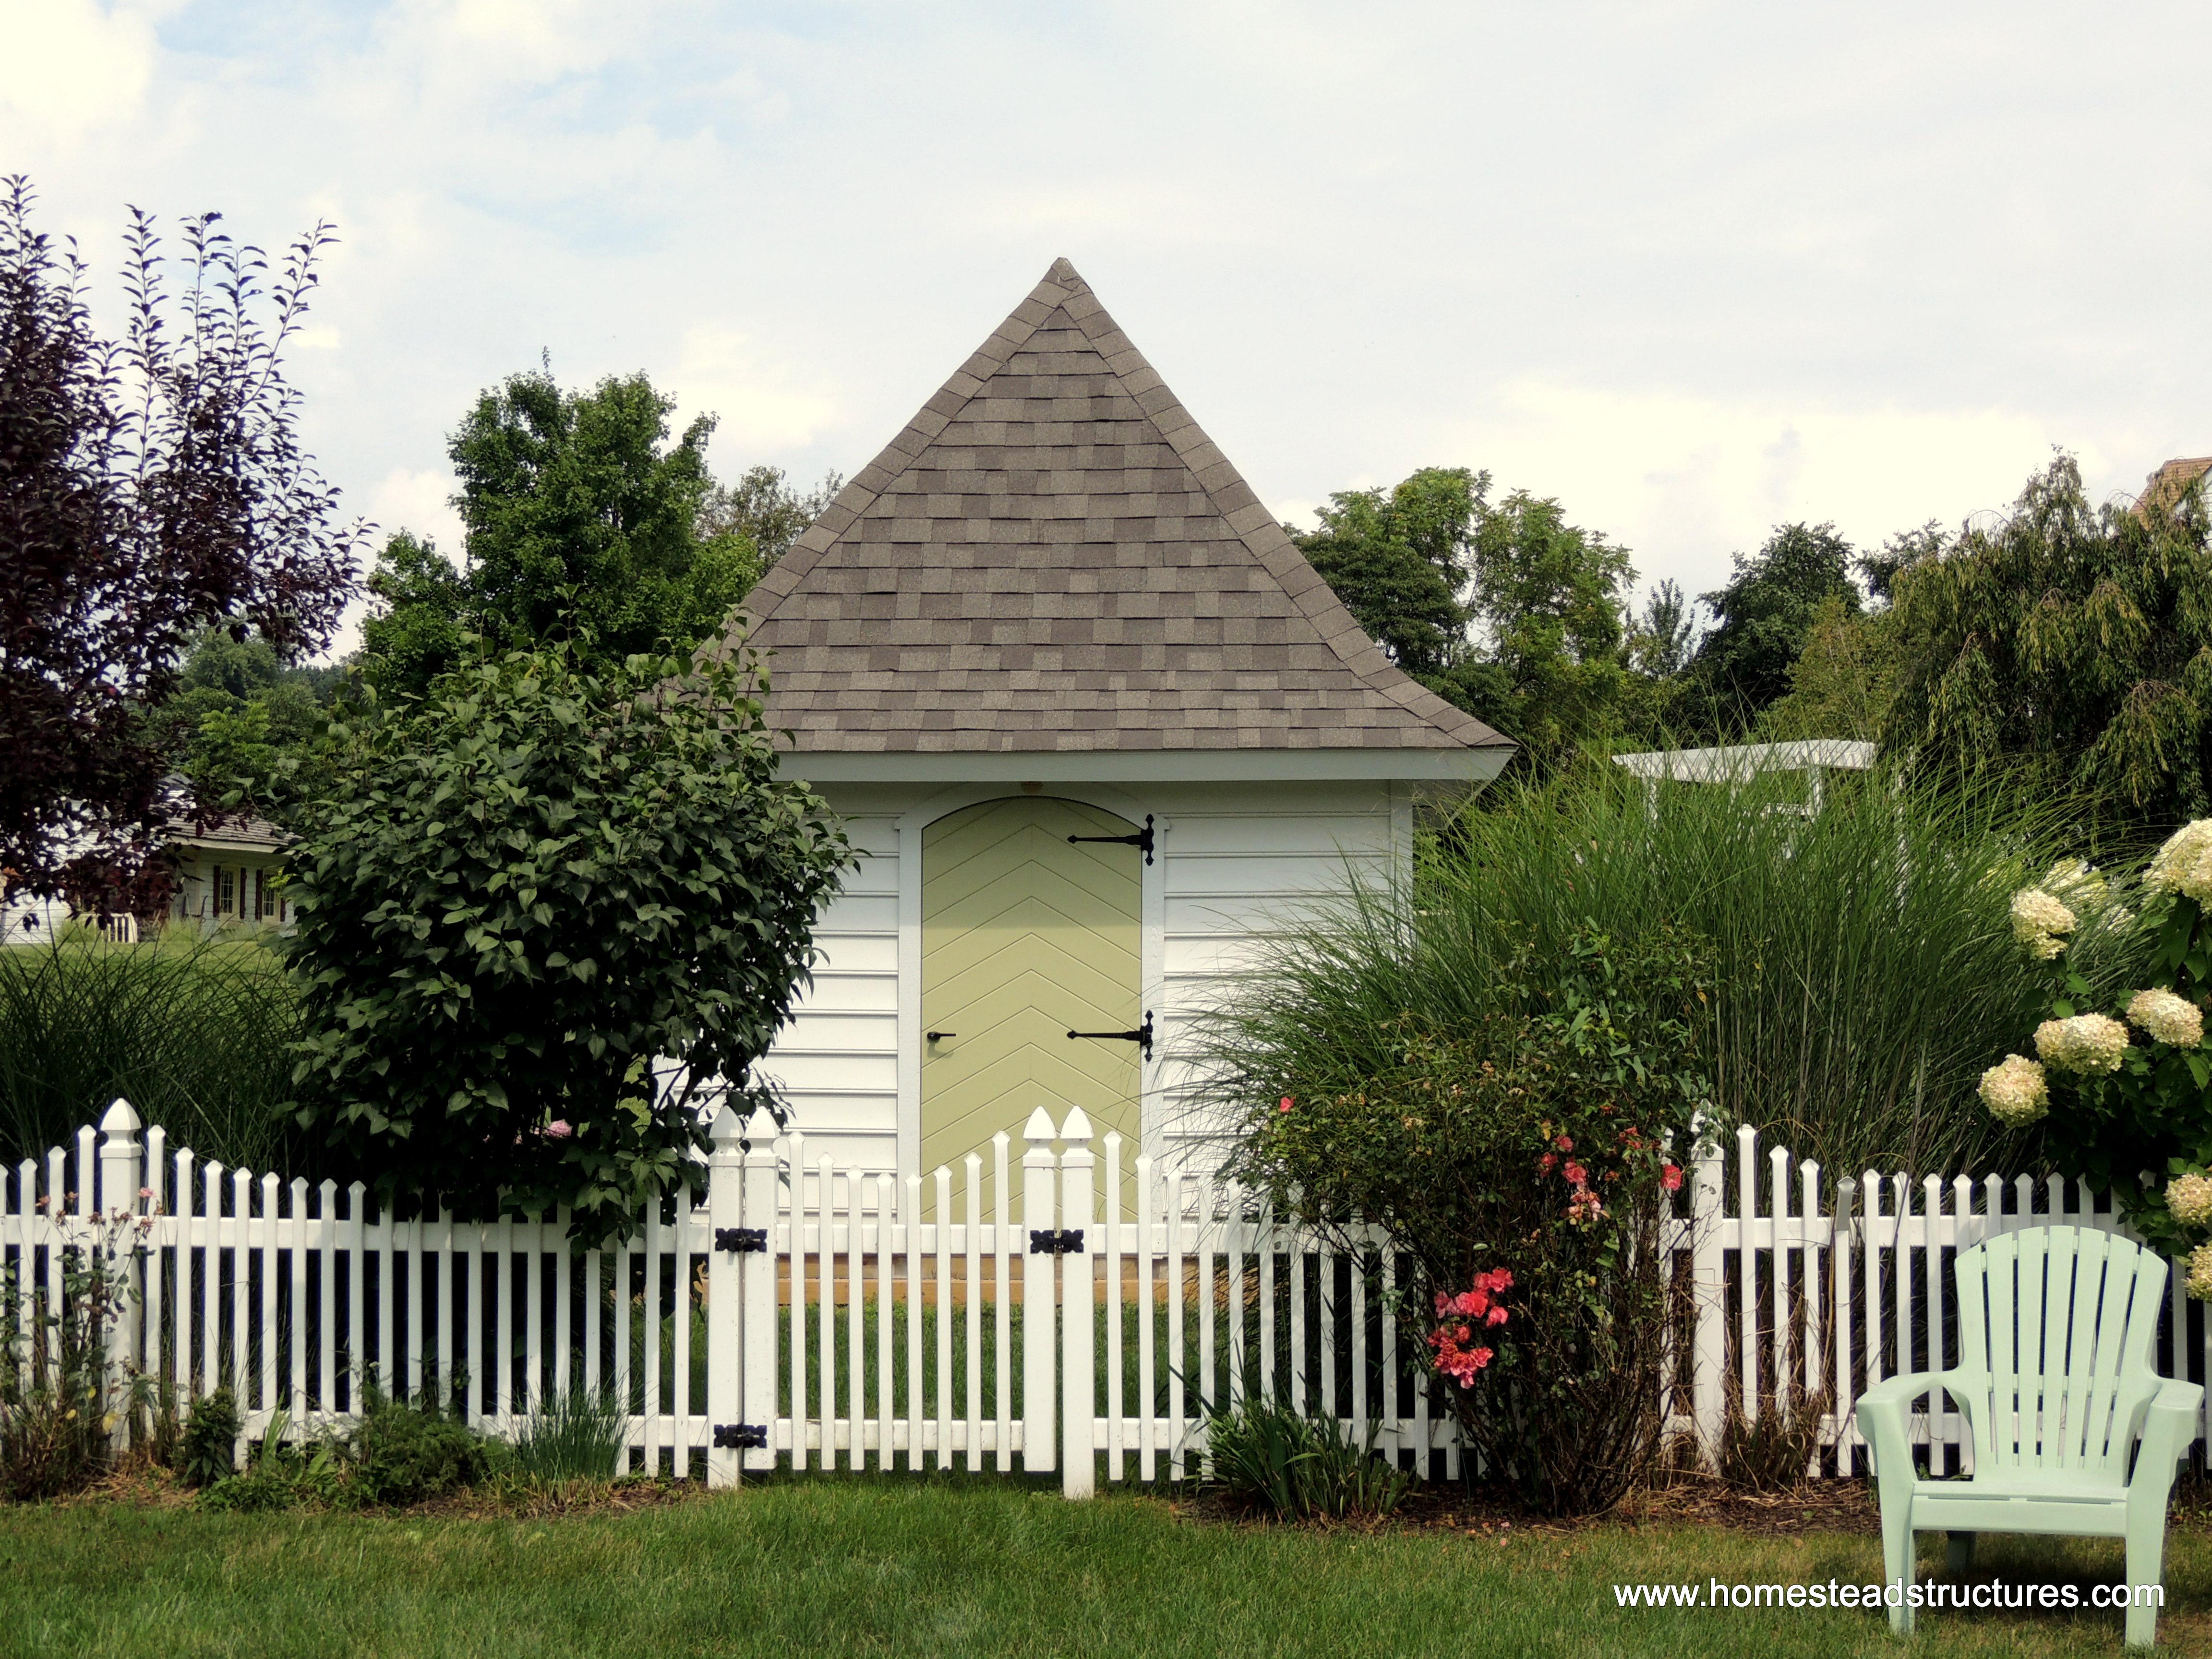 Garden Sheds 10 X 10 garden sheds for garden storage, tool sheds | homestead structures